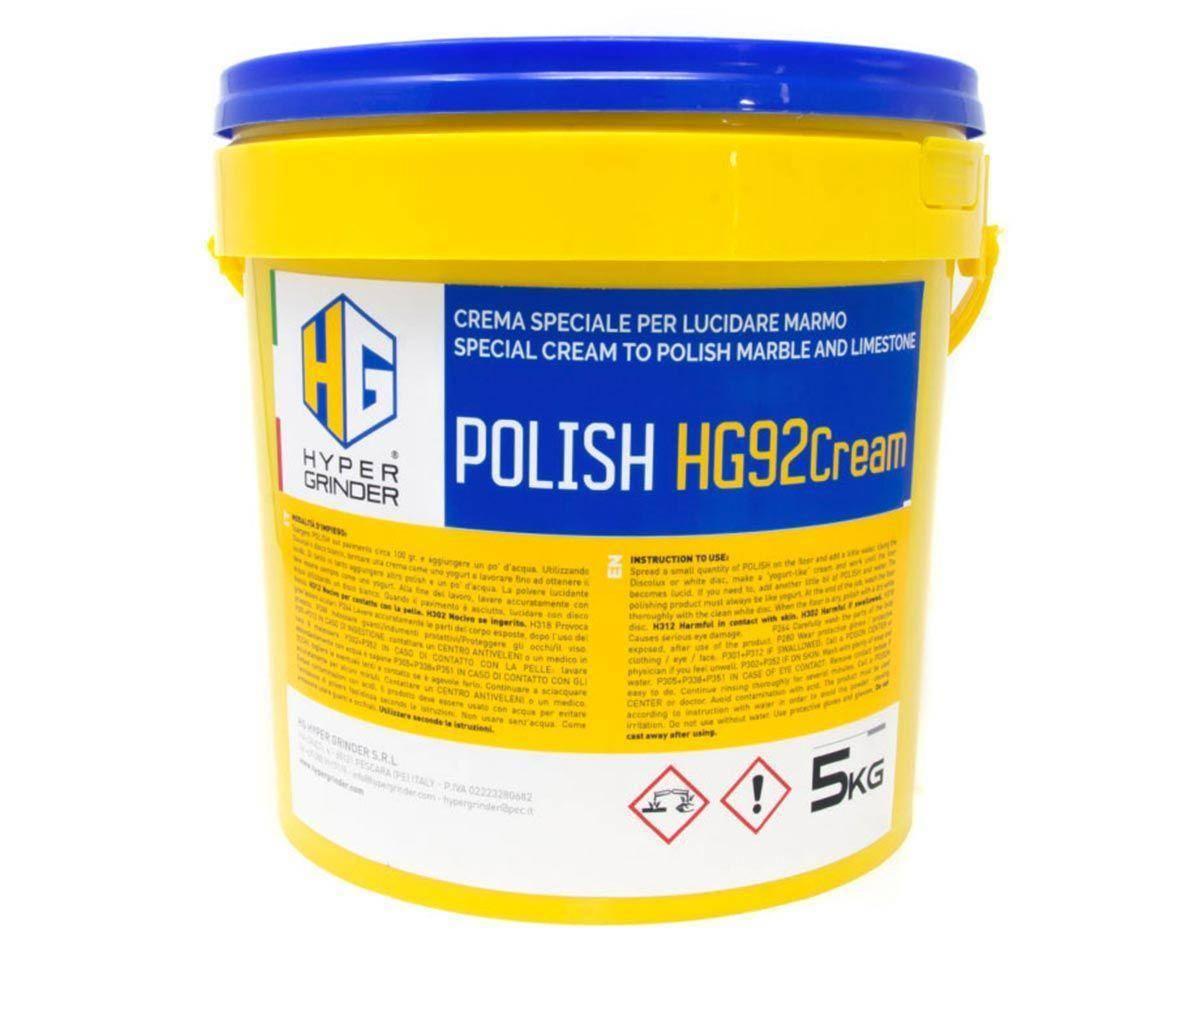 PolishHG92cream 1624